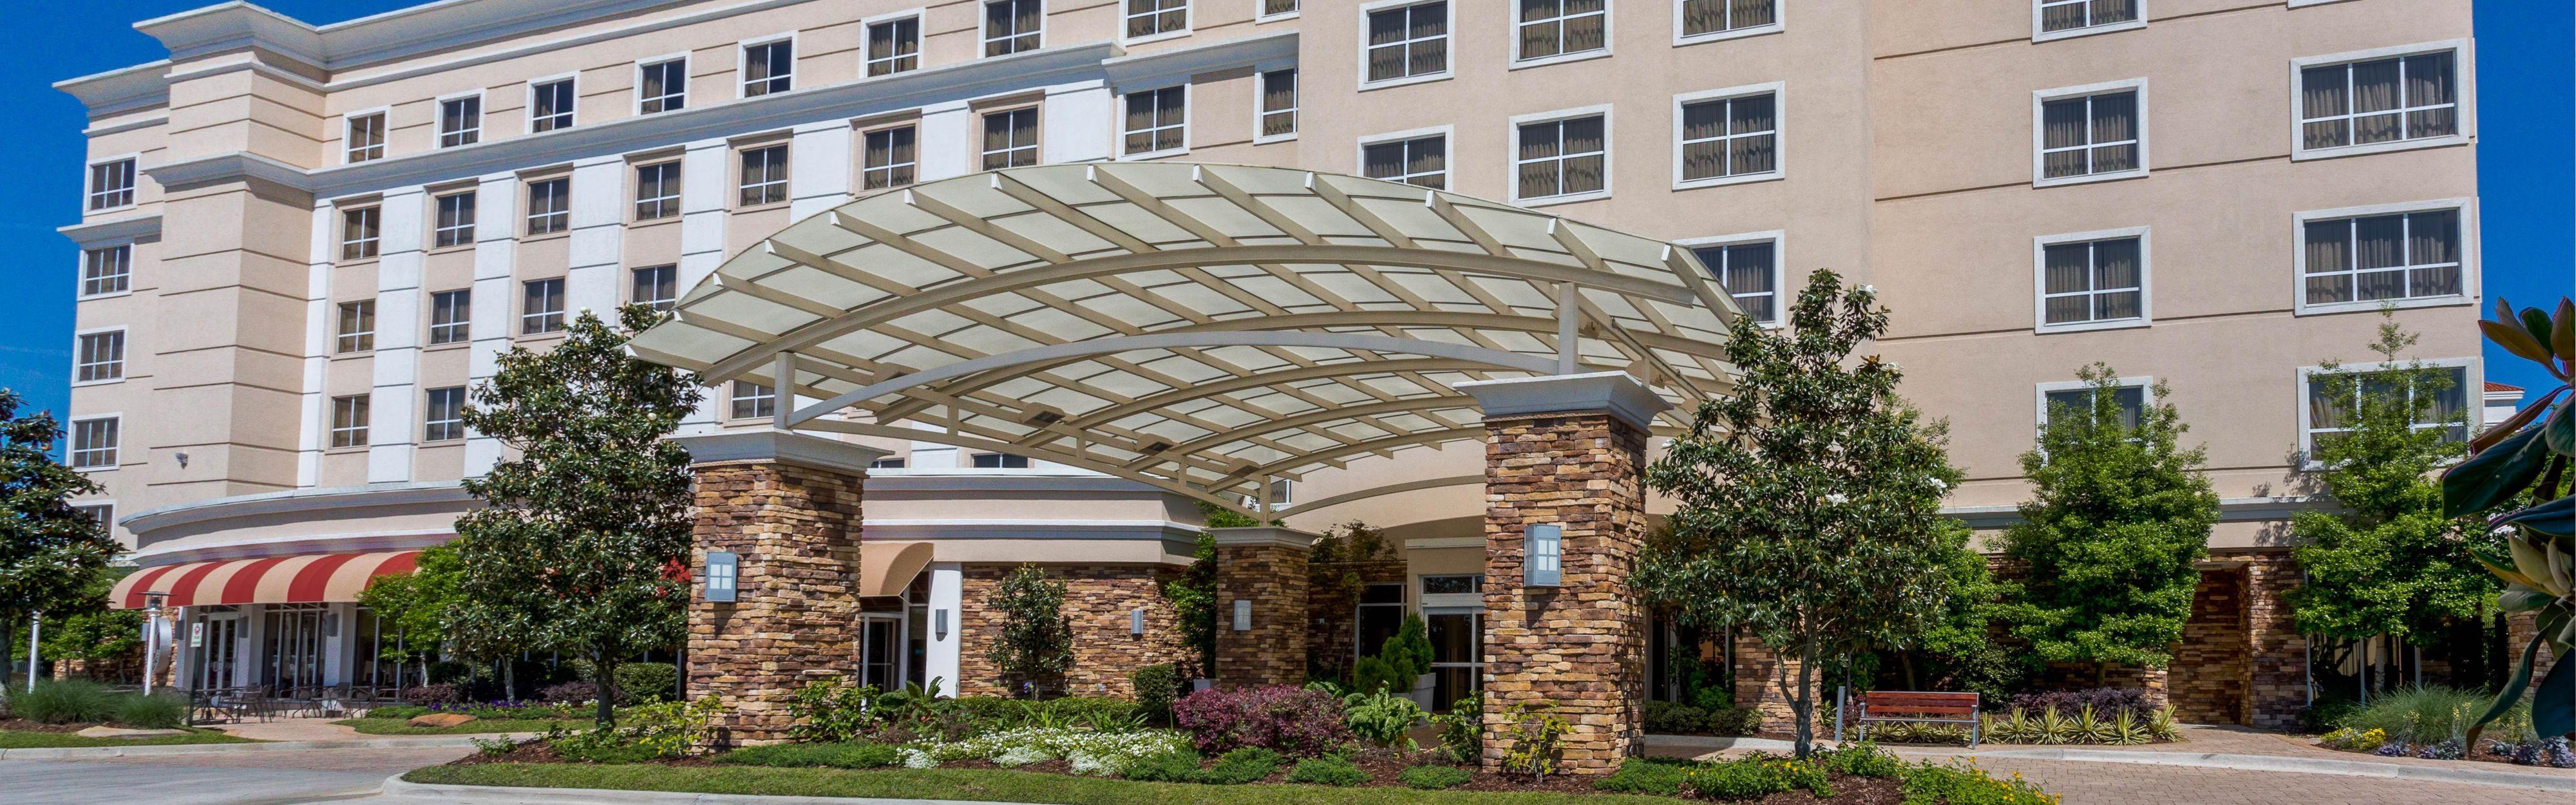 Holiday Inn Baton Rouge College Drive I-10 image 0